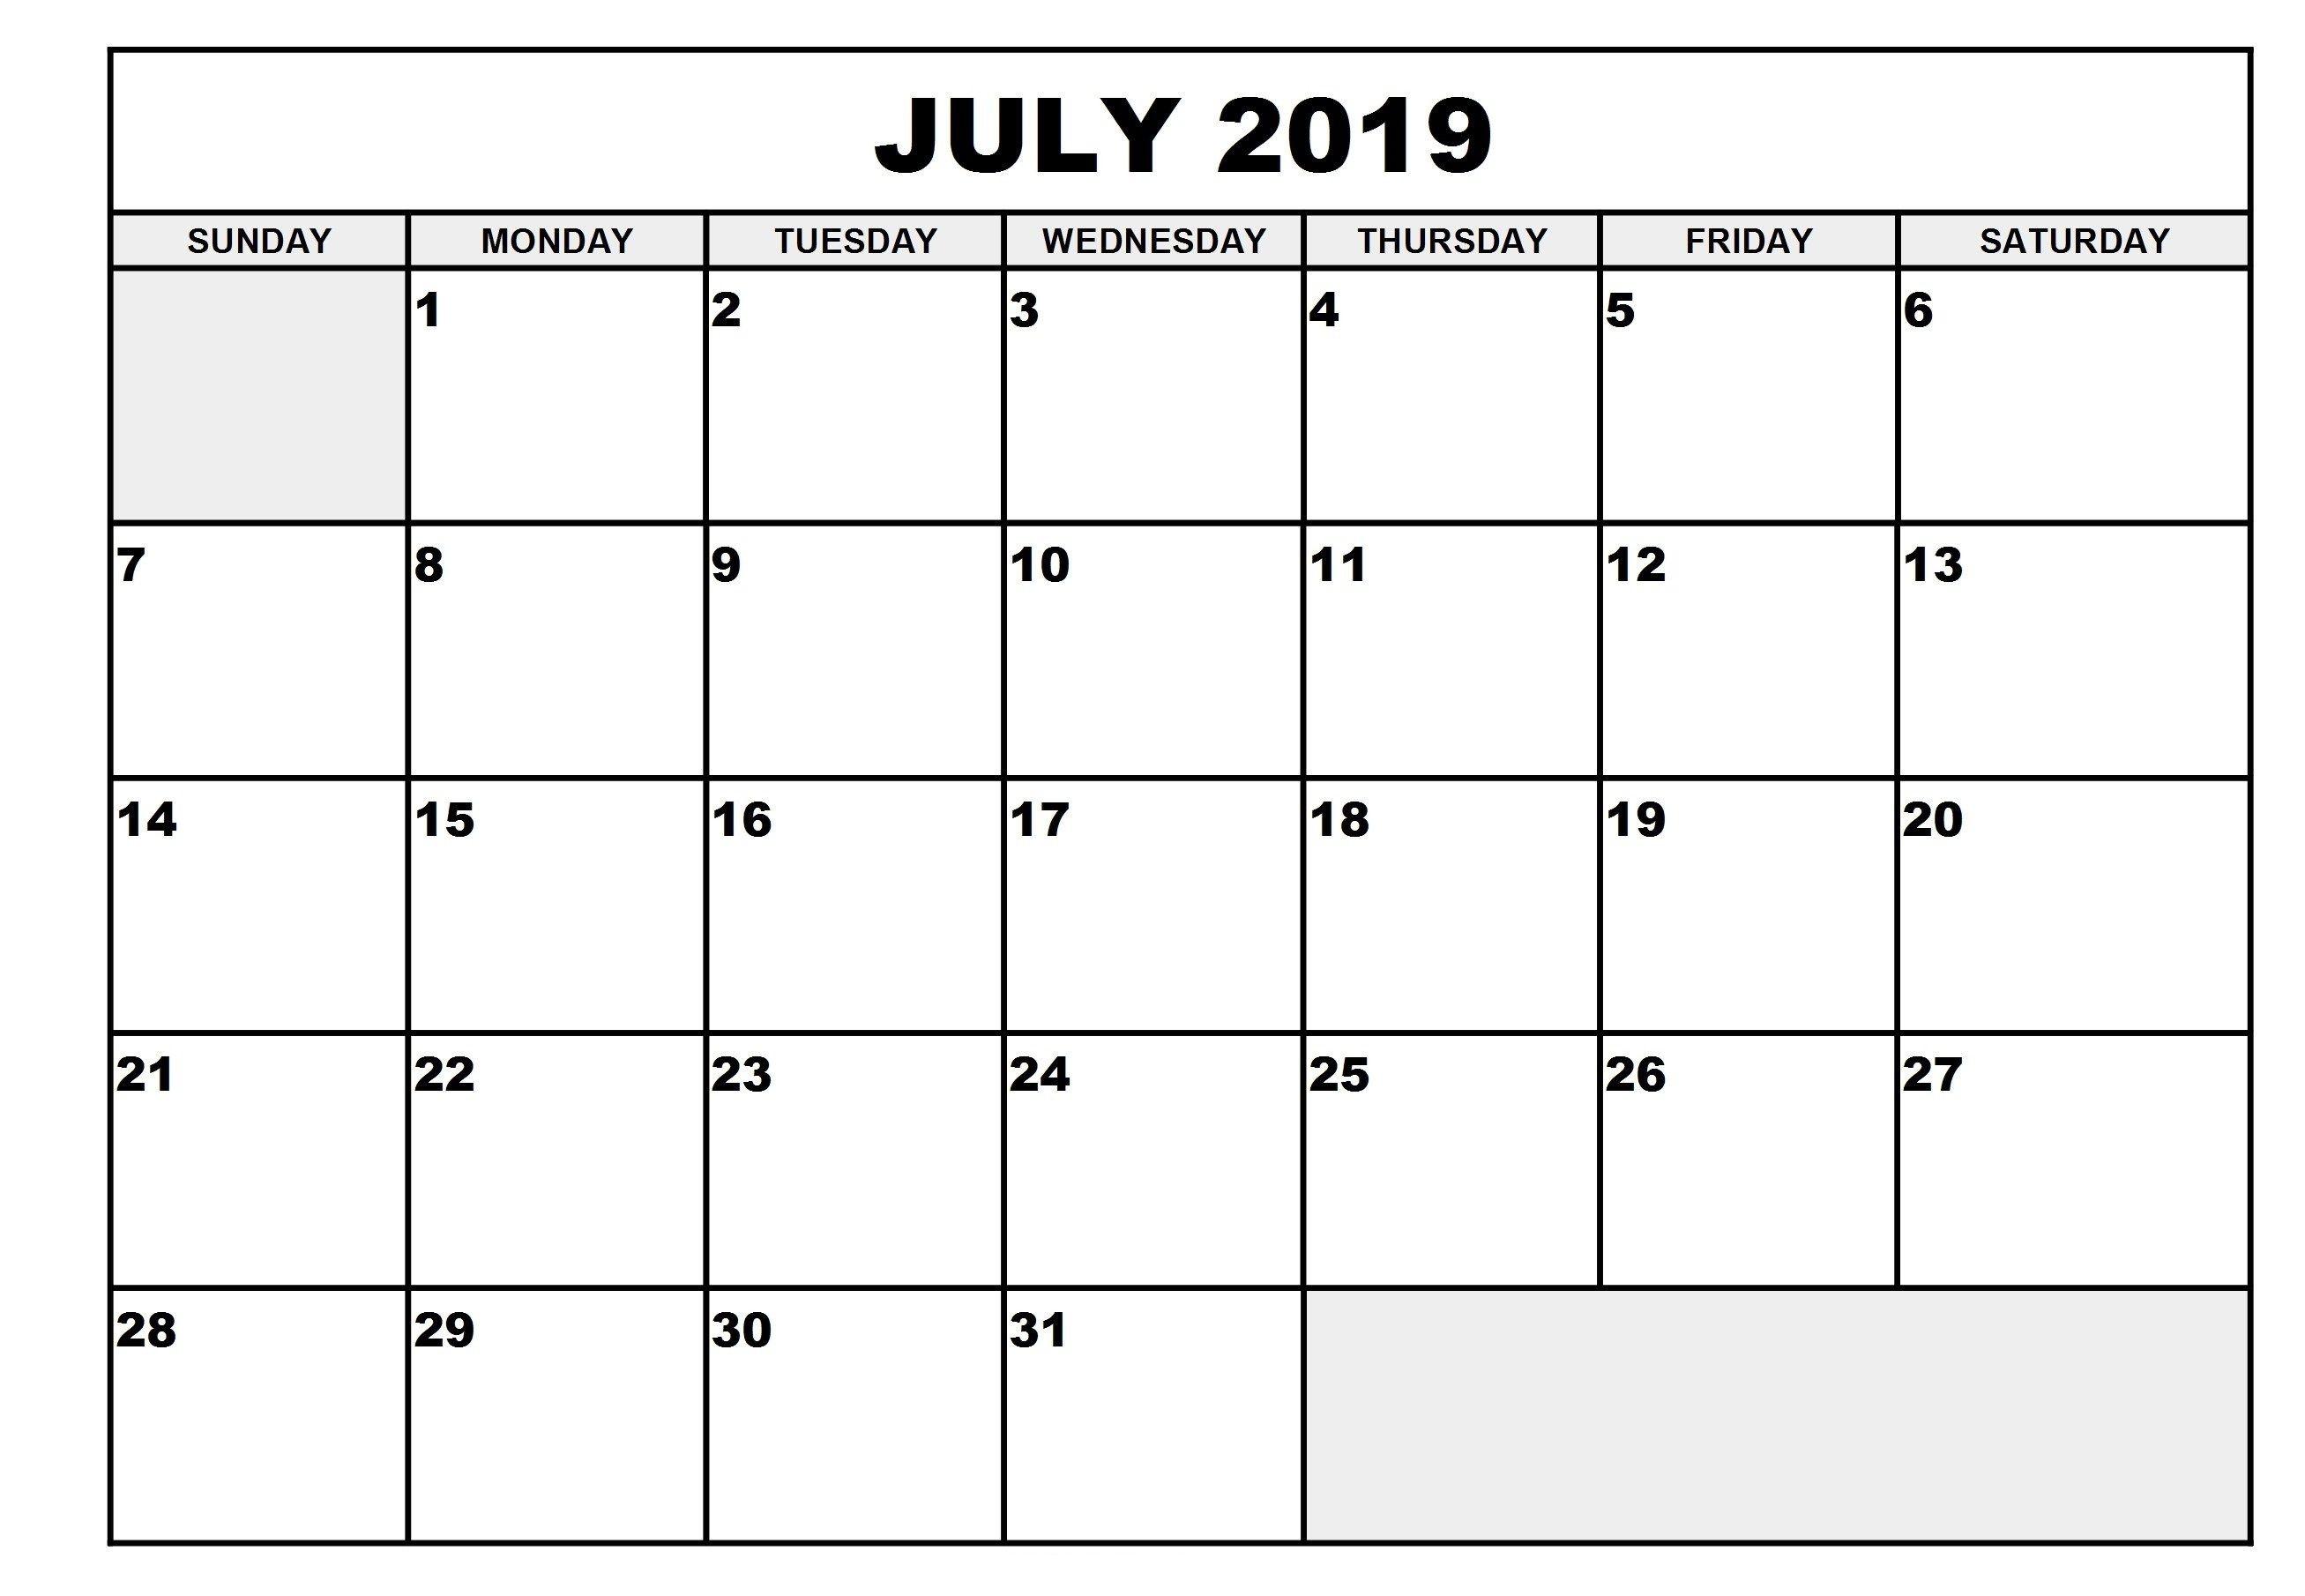 Free Printable July 2019 Calendar Full Page | Free Printable  Full Page Calender